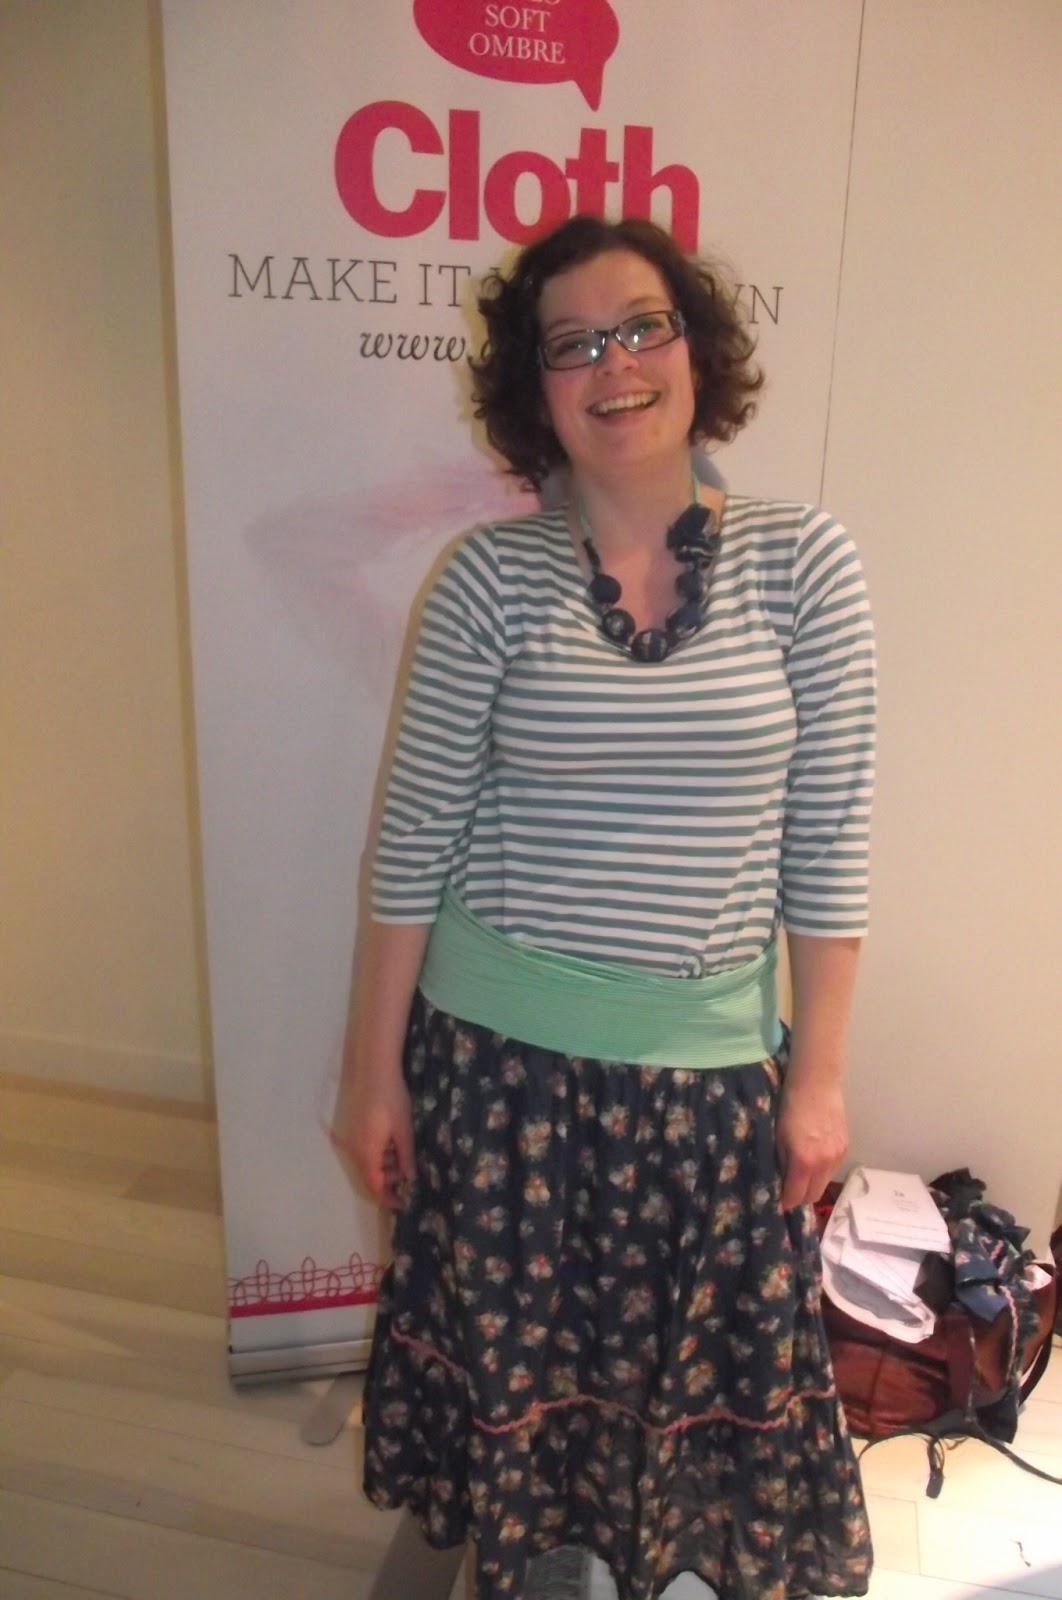 A Craft & Lifestyle Blog: Cloth